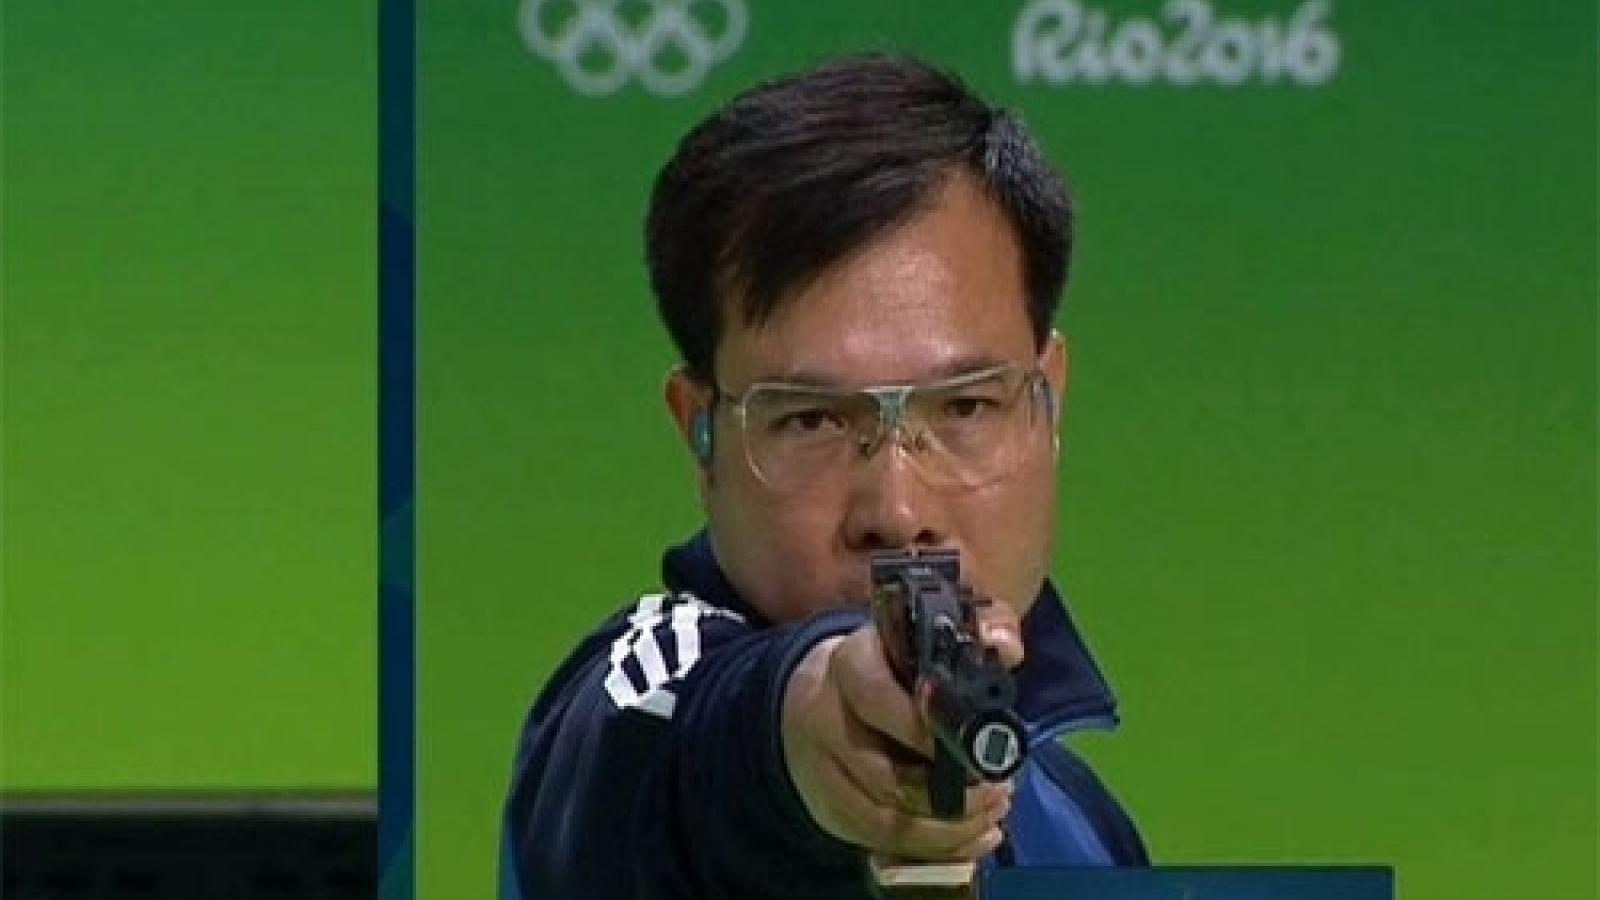 Shooter Xuan Vinh retains No. 1 world ranking in 10m air pistol